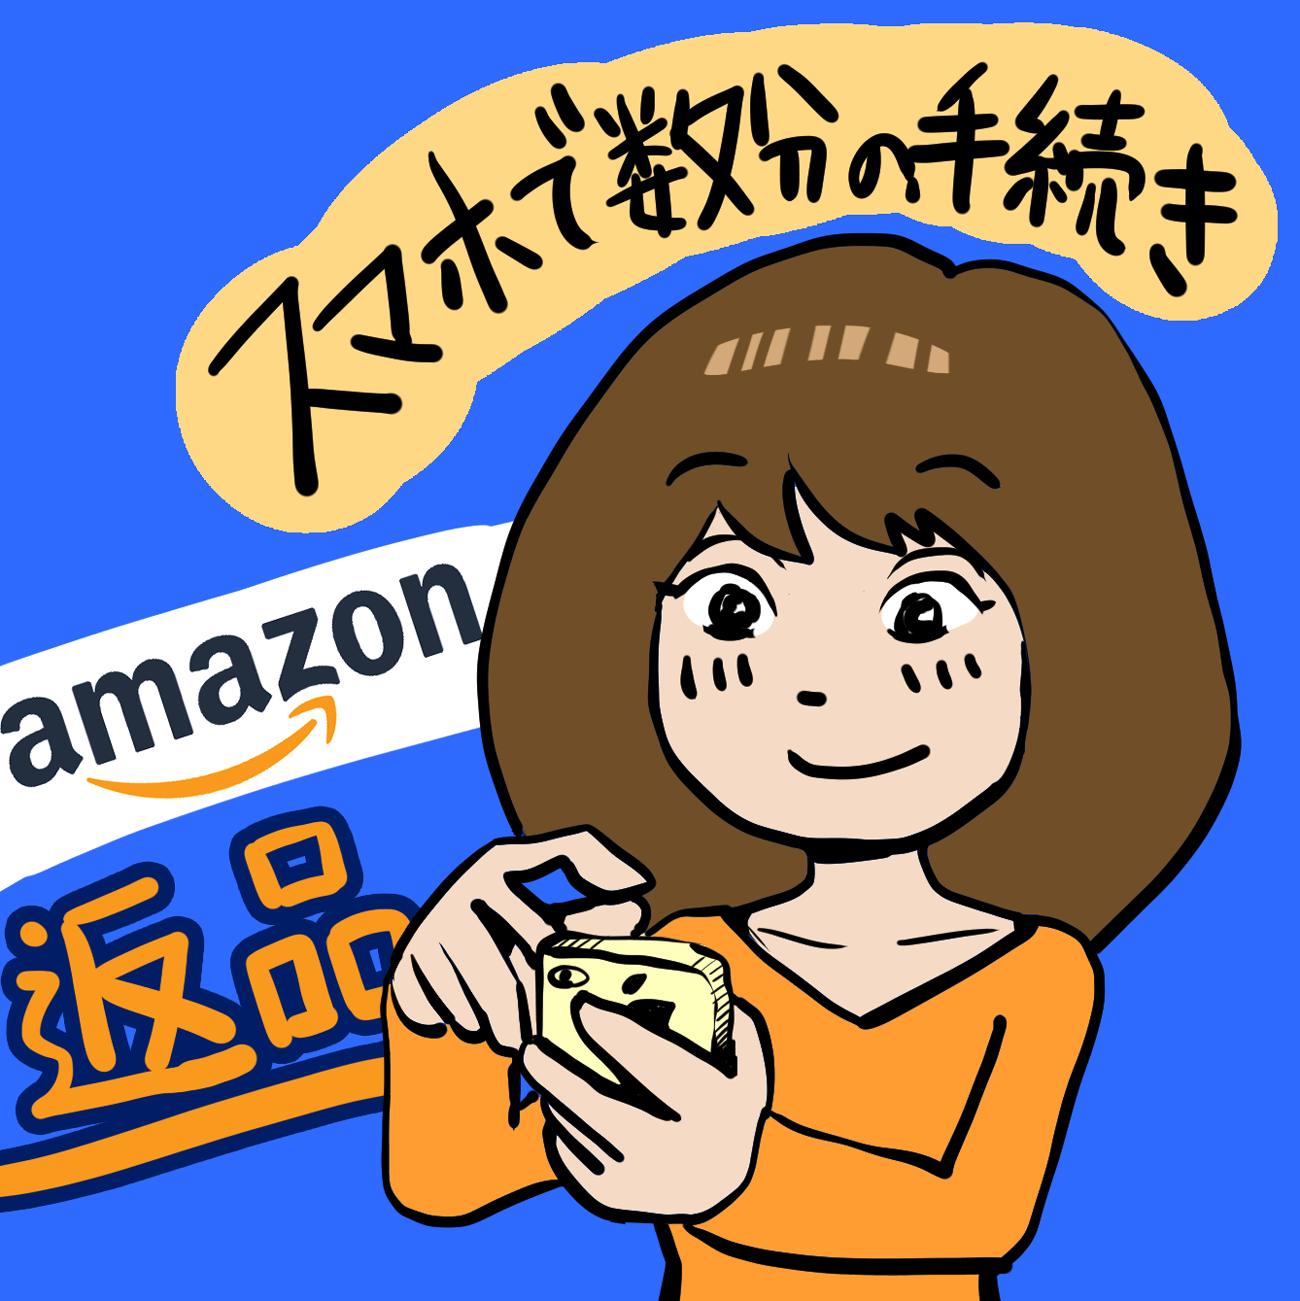 Amazonで購入した商品の返品は簡単